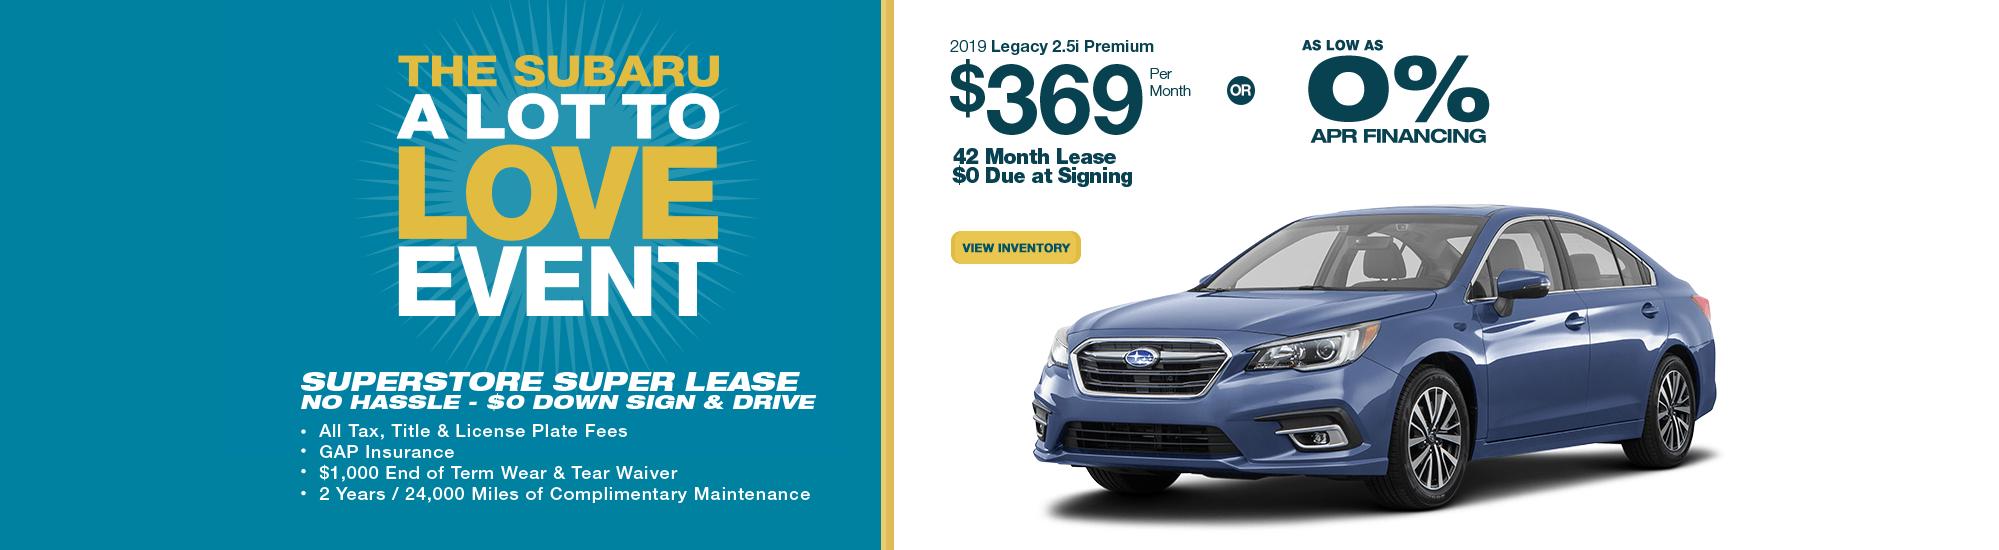 2019 Subaru Legacy 2.5i Premium lease or low APR special in Chandler, AZ